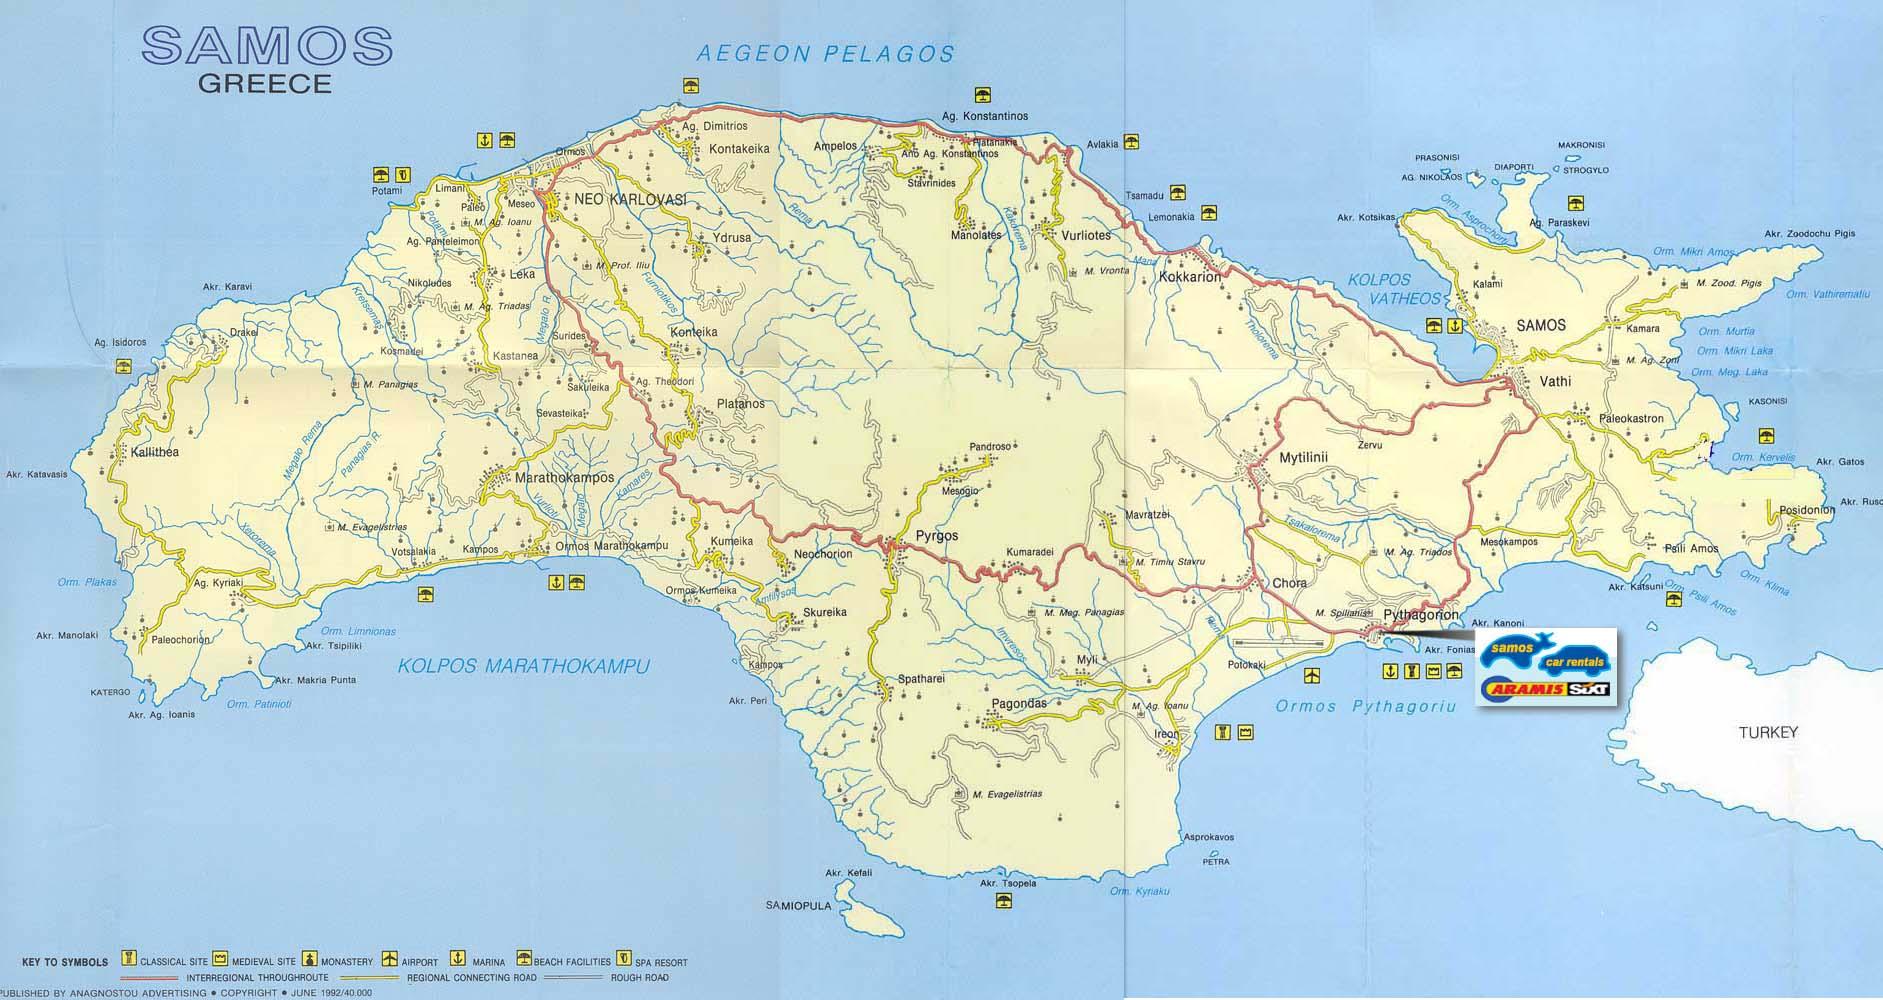 Samos Tourist Map See map details From samos-car-rentals.com Created 6 ...